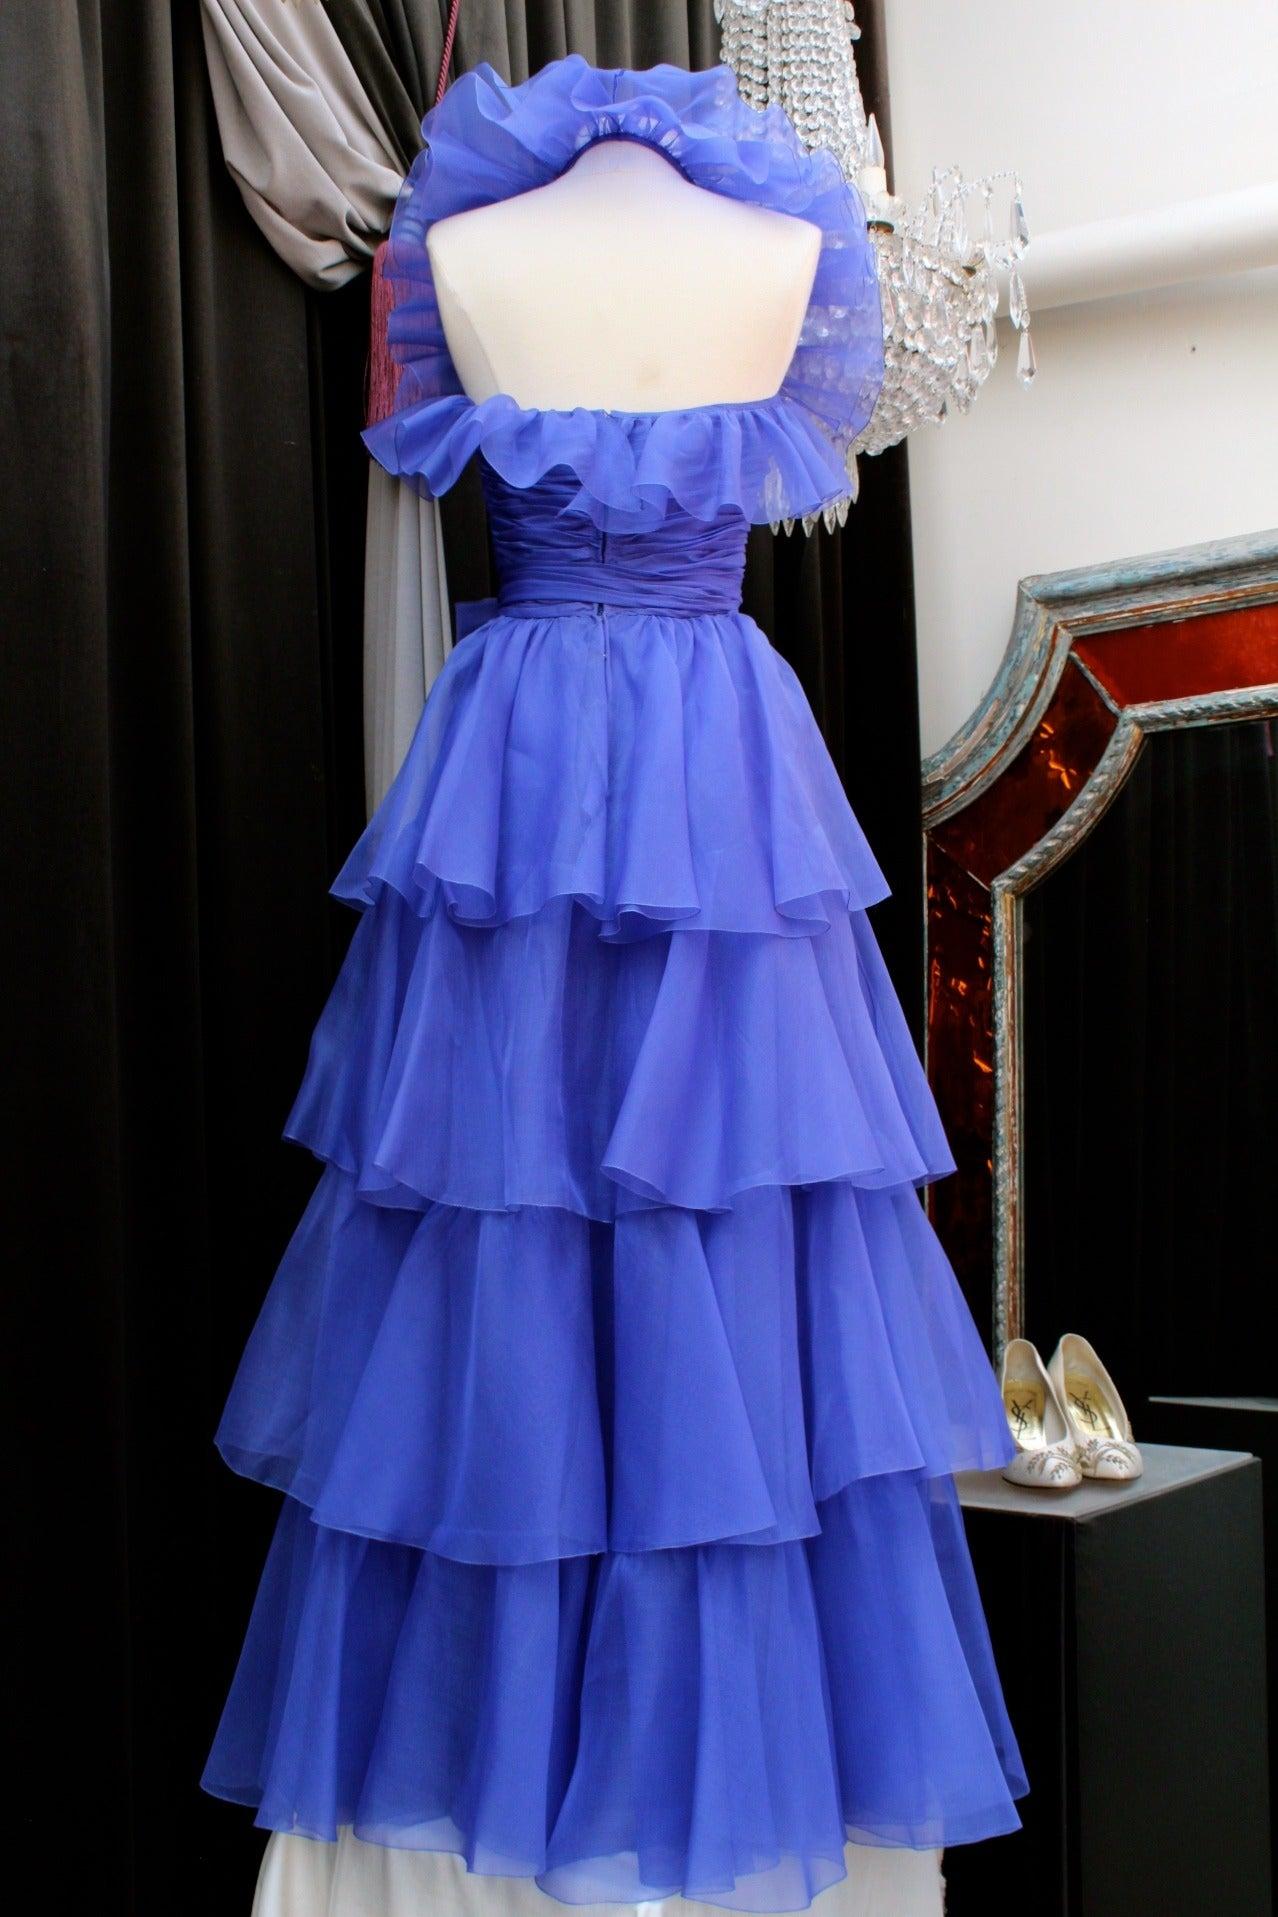 Jean-Louis Scherrer Haute Couture Blue Organza Evening Gown, 1980s  In Good Condition For Sale In Paris, FR